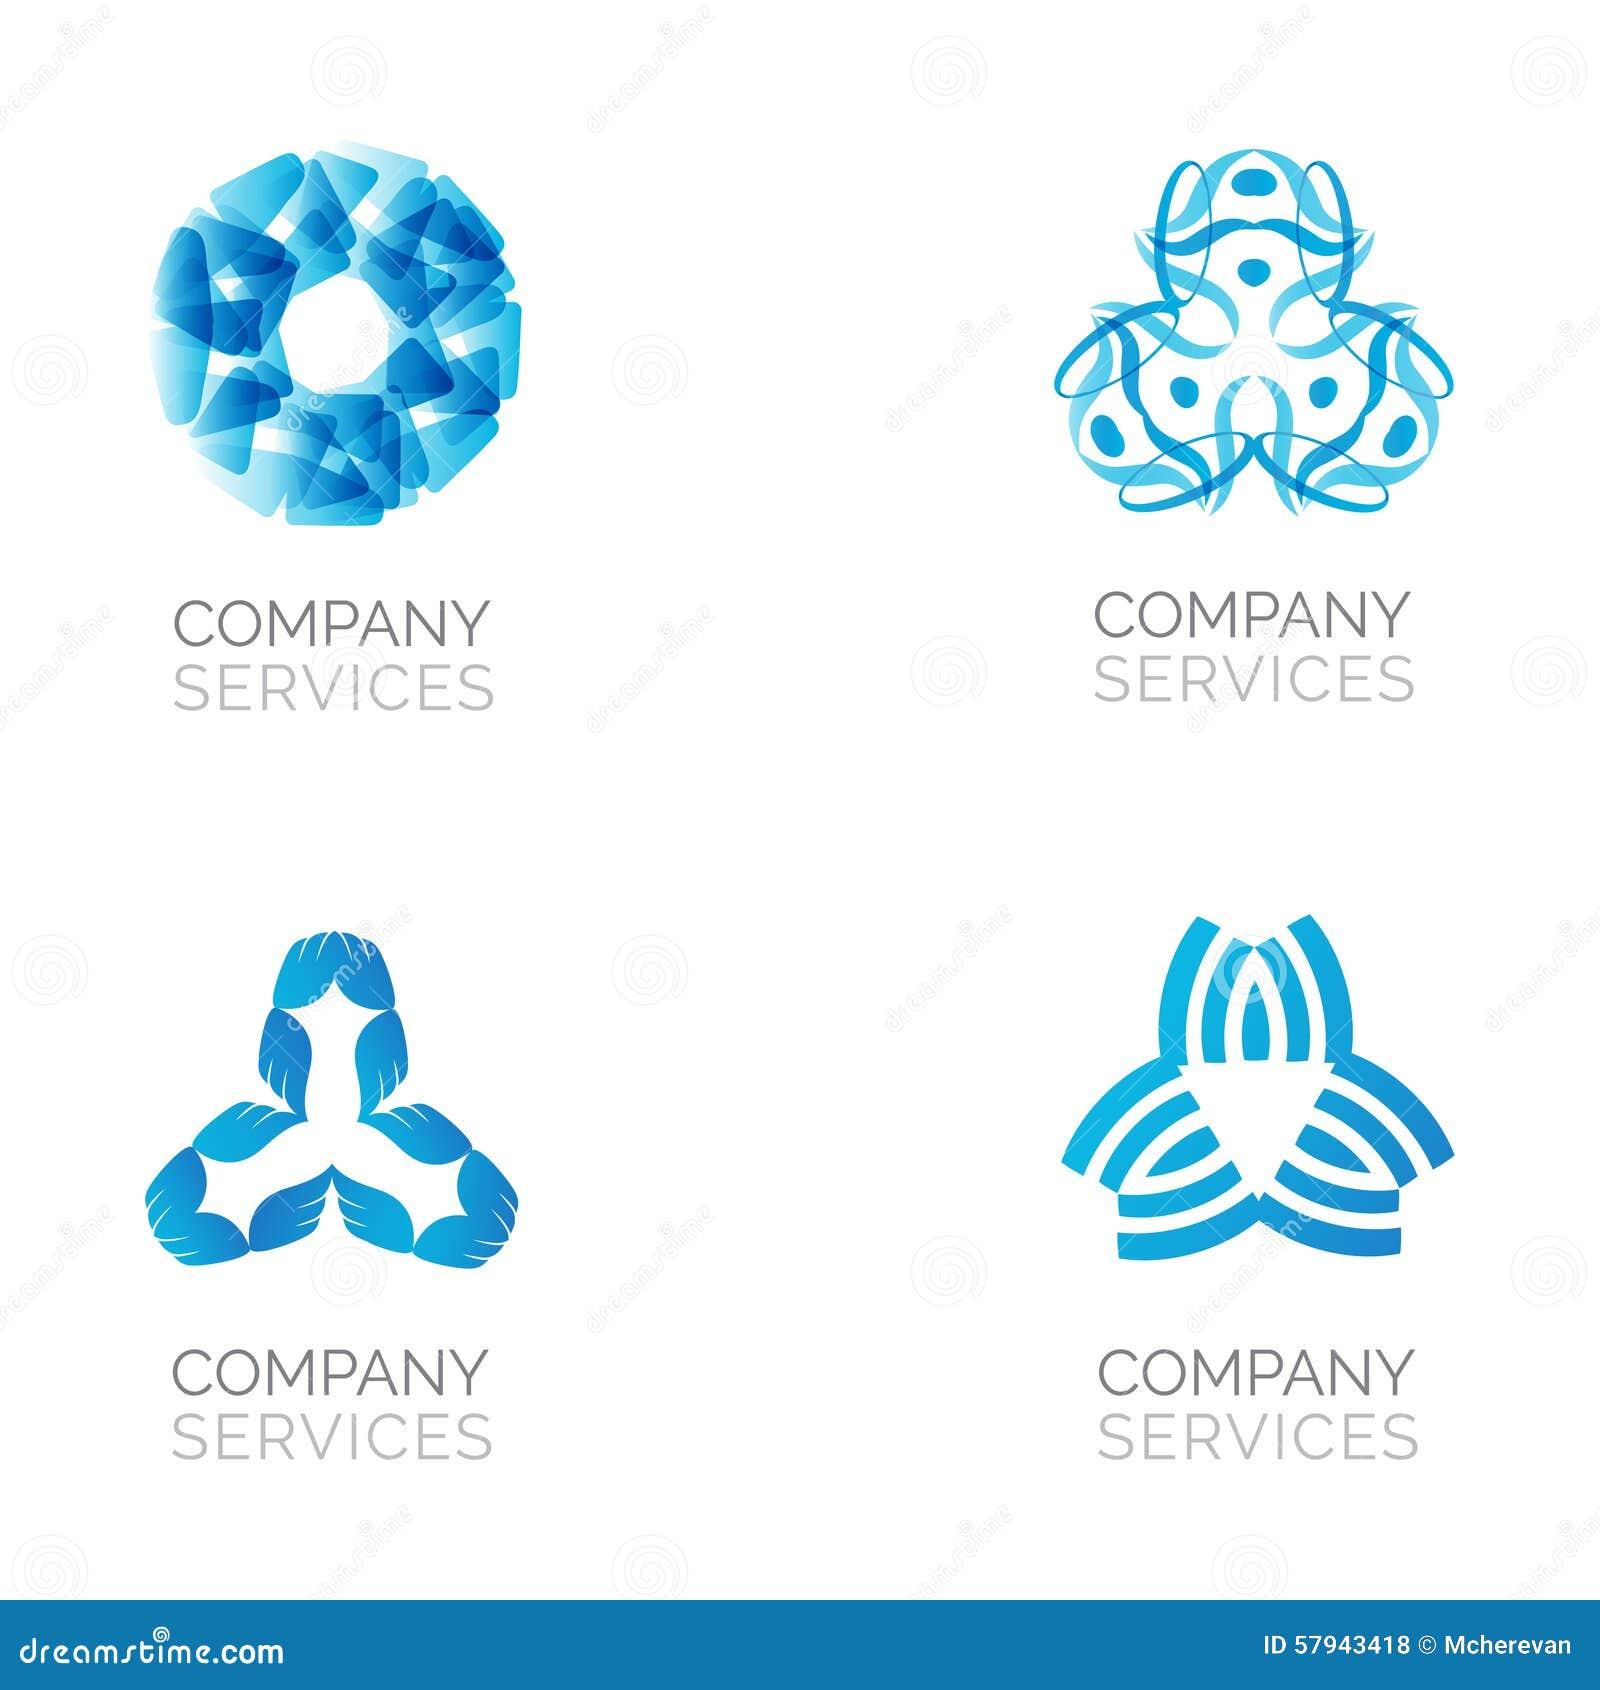 3 Blue People Logo | Car Interior Design